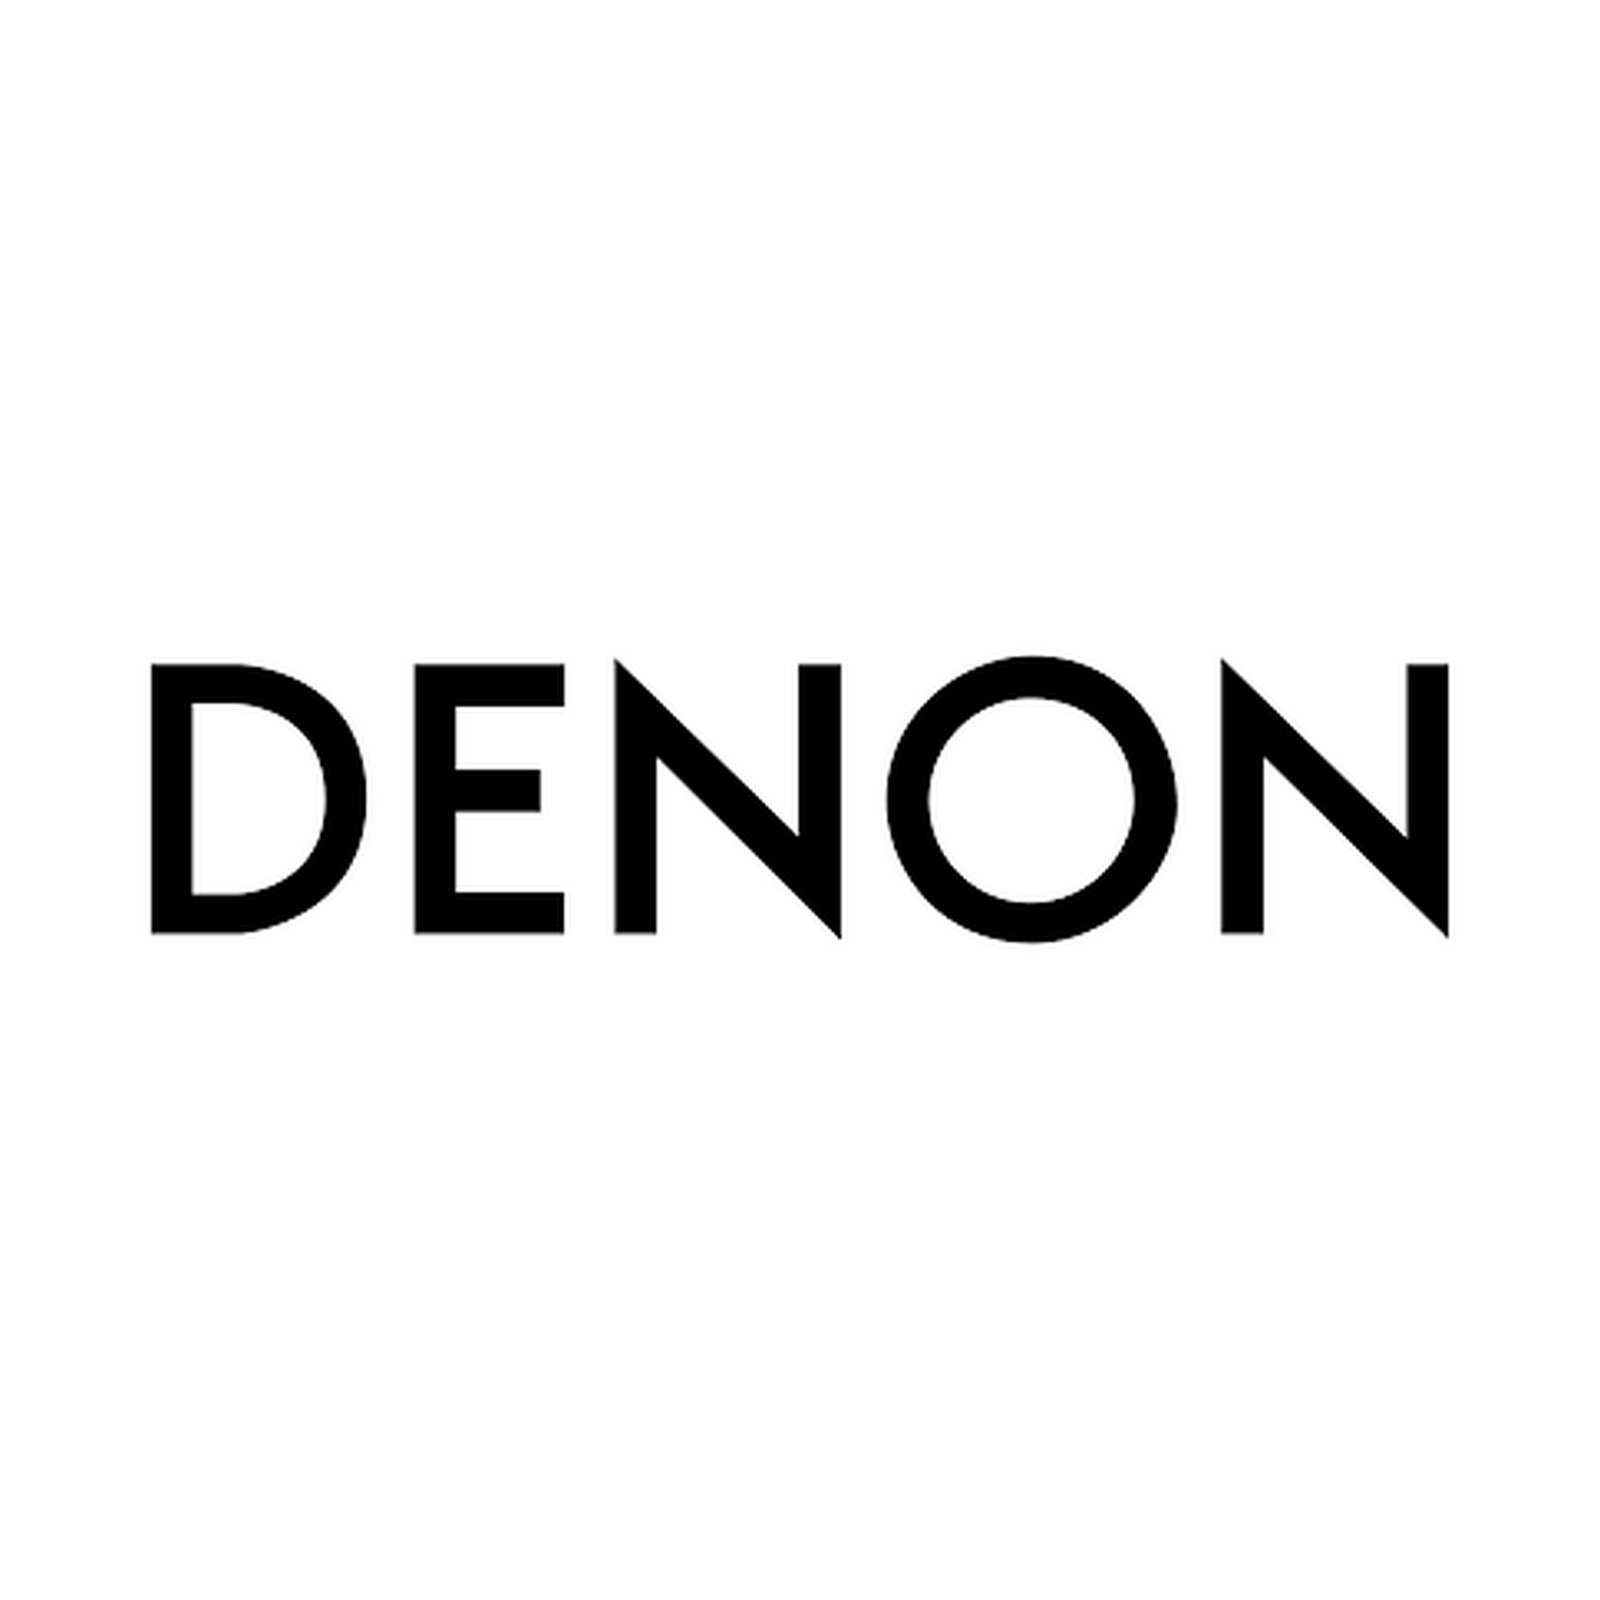 Denon DJ DNVINYLBLACK | Black Colored Vinyl for SC3900 and DNS3700